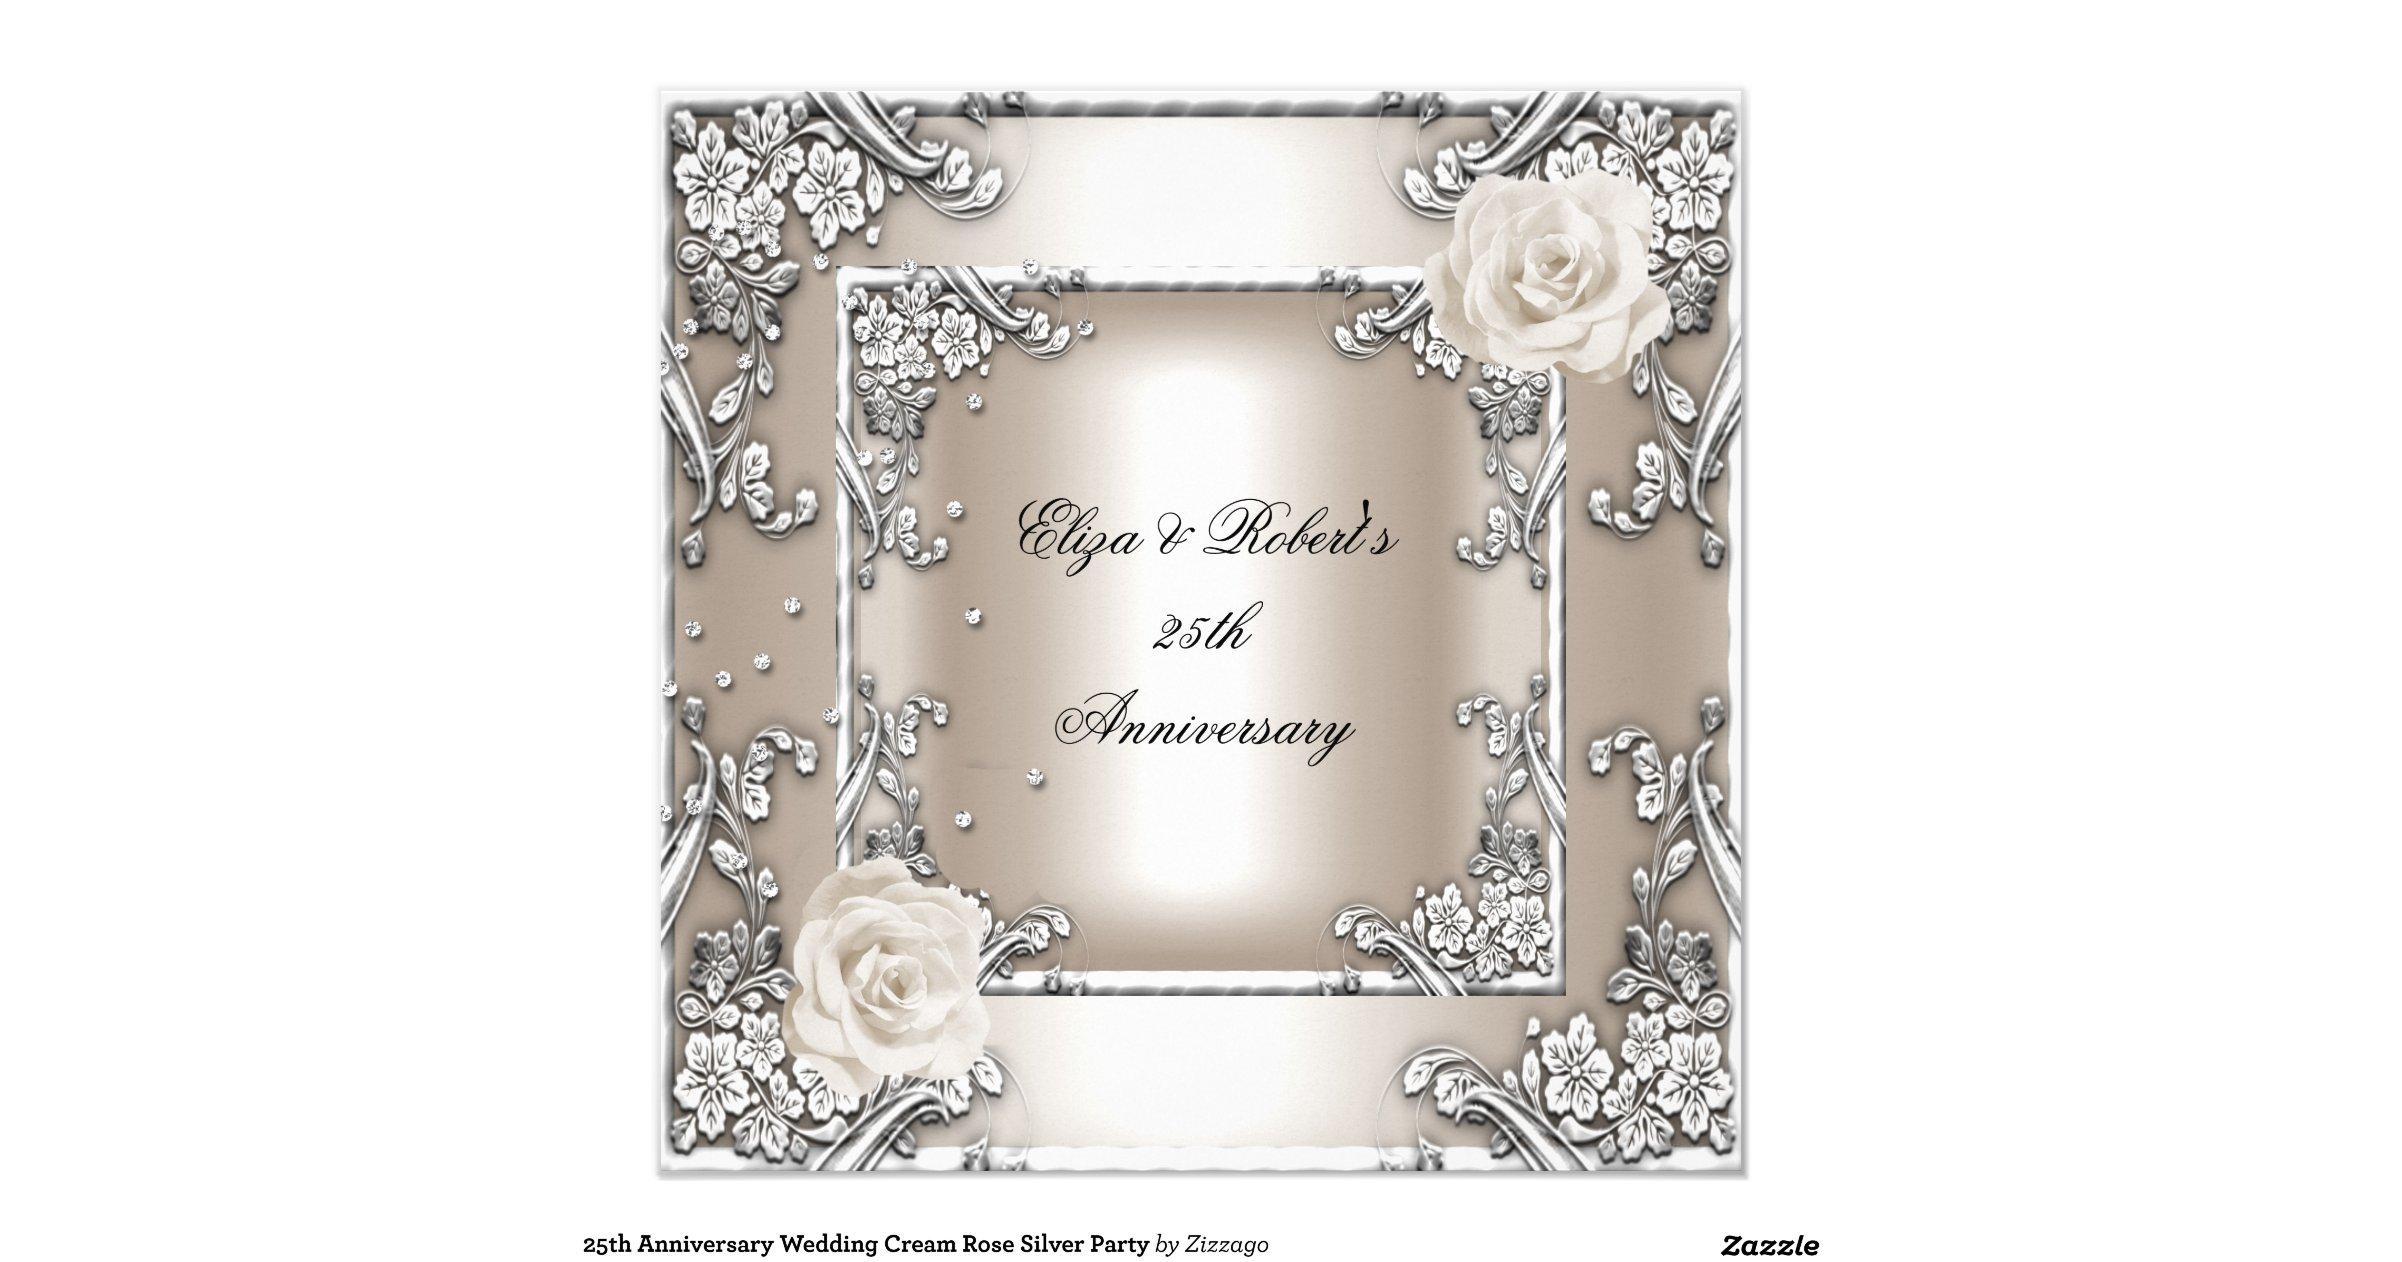 25th Wedding Anniversary Gift Experiences : 25th_anniversary_wedding_cream_rose_silver_party_invitation ...